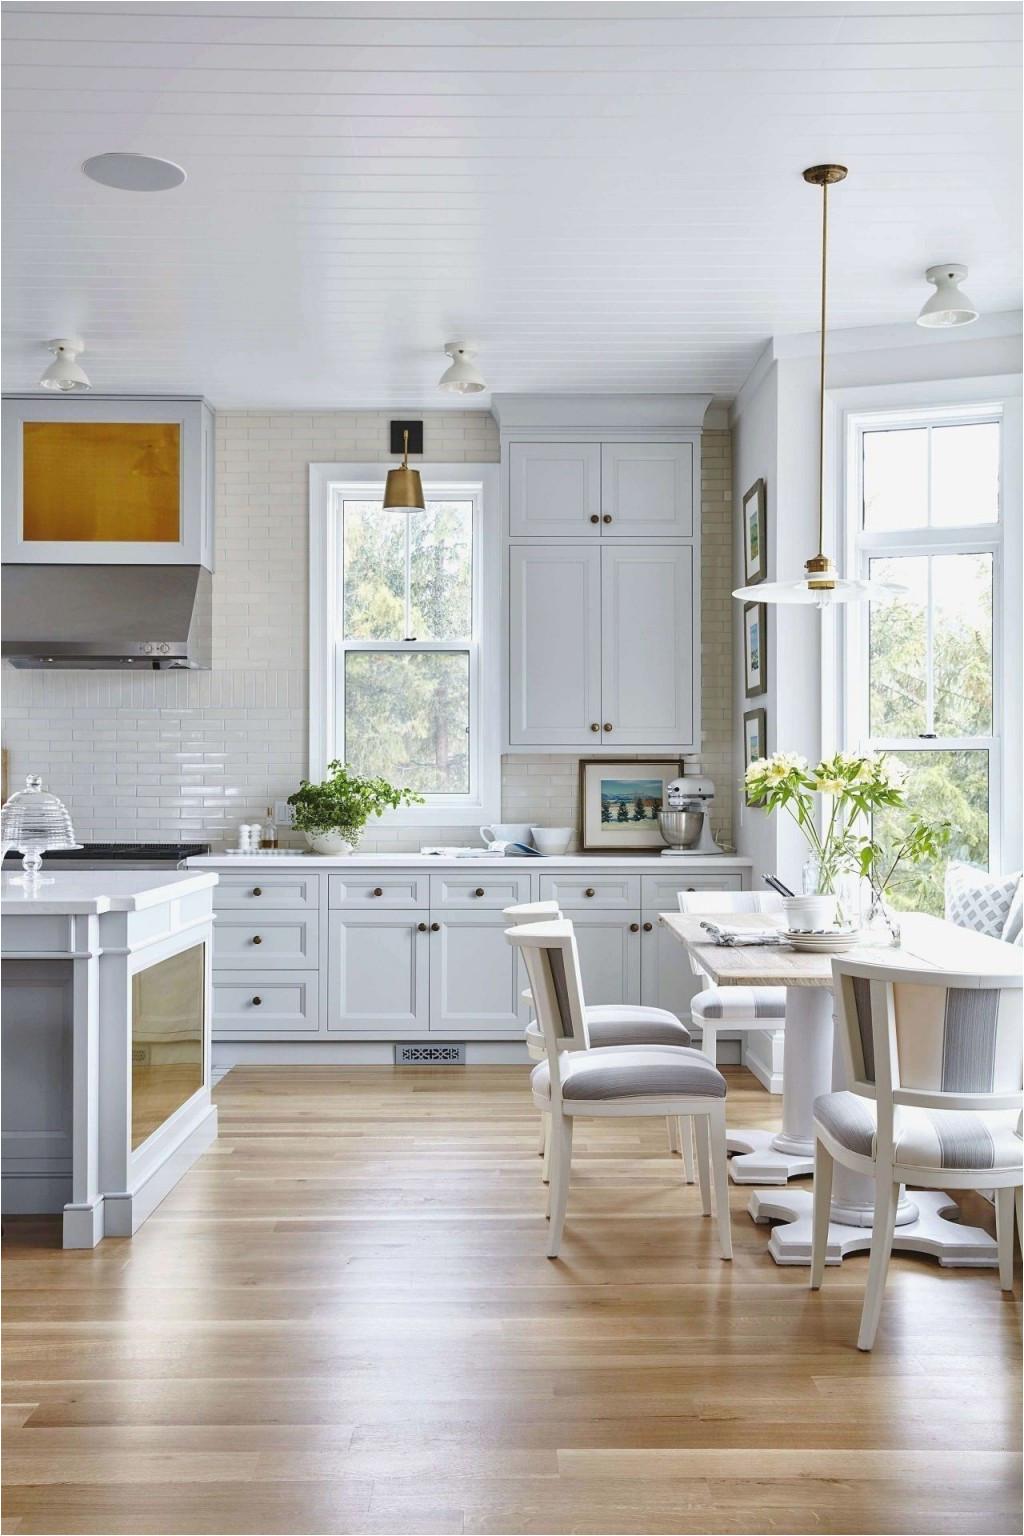 red kitchen theme ideas new gray bedroom decor elegant kitchen joys kitchen joys kitchen 0d